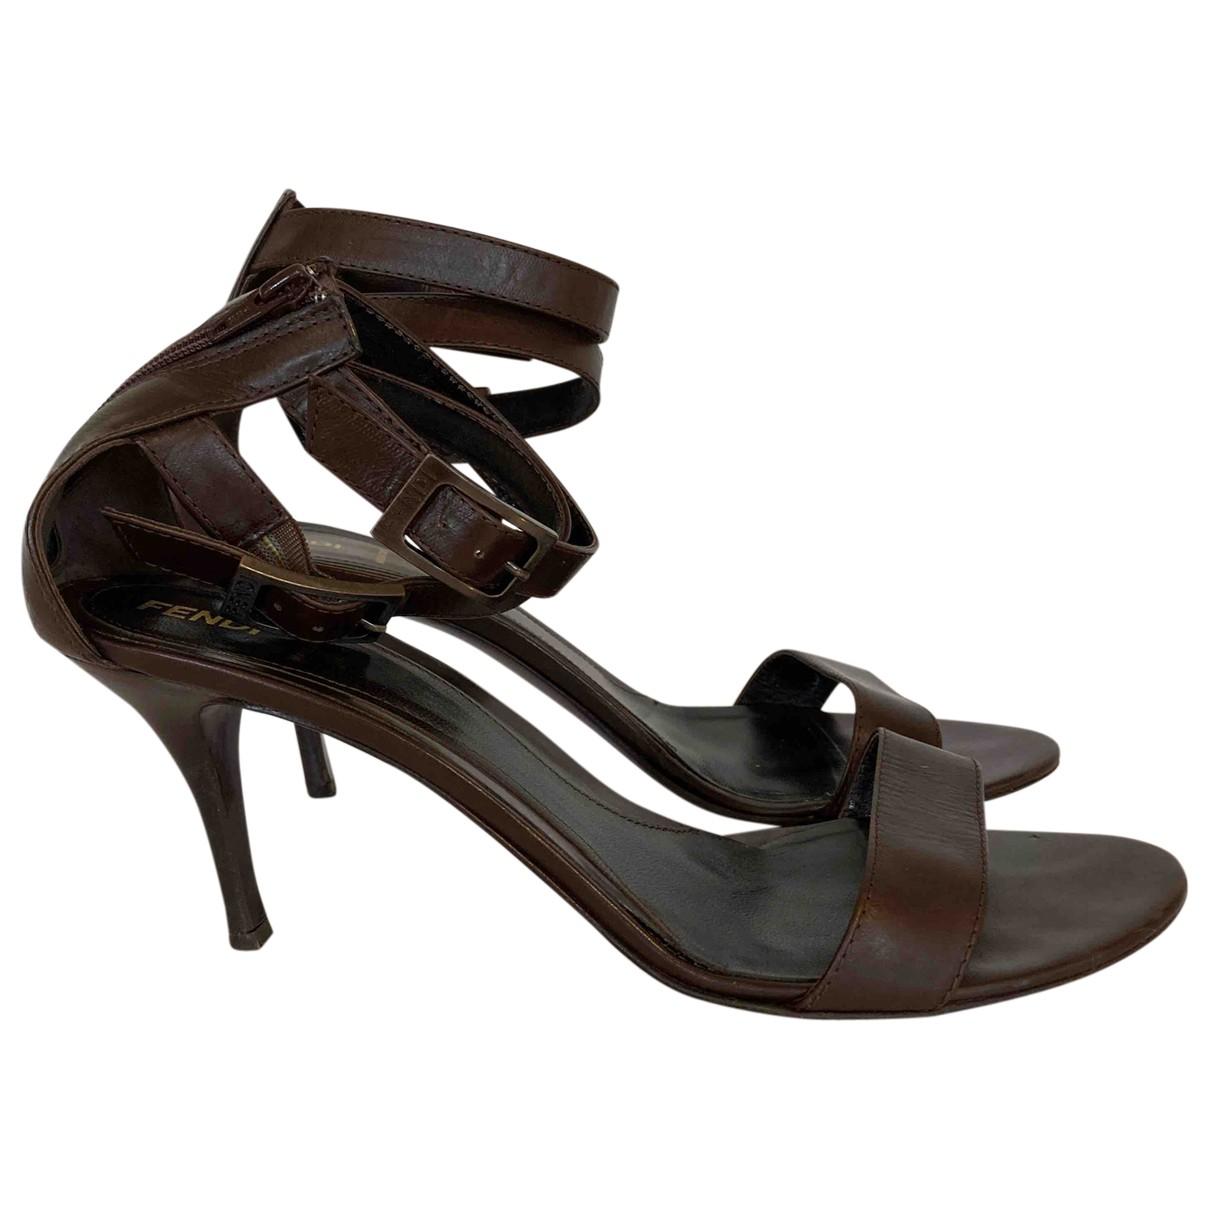 Fendi \N Brown Leather Heels for Women 40.5 EU